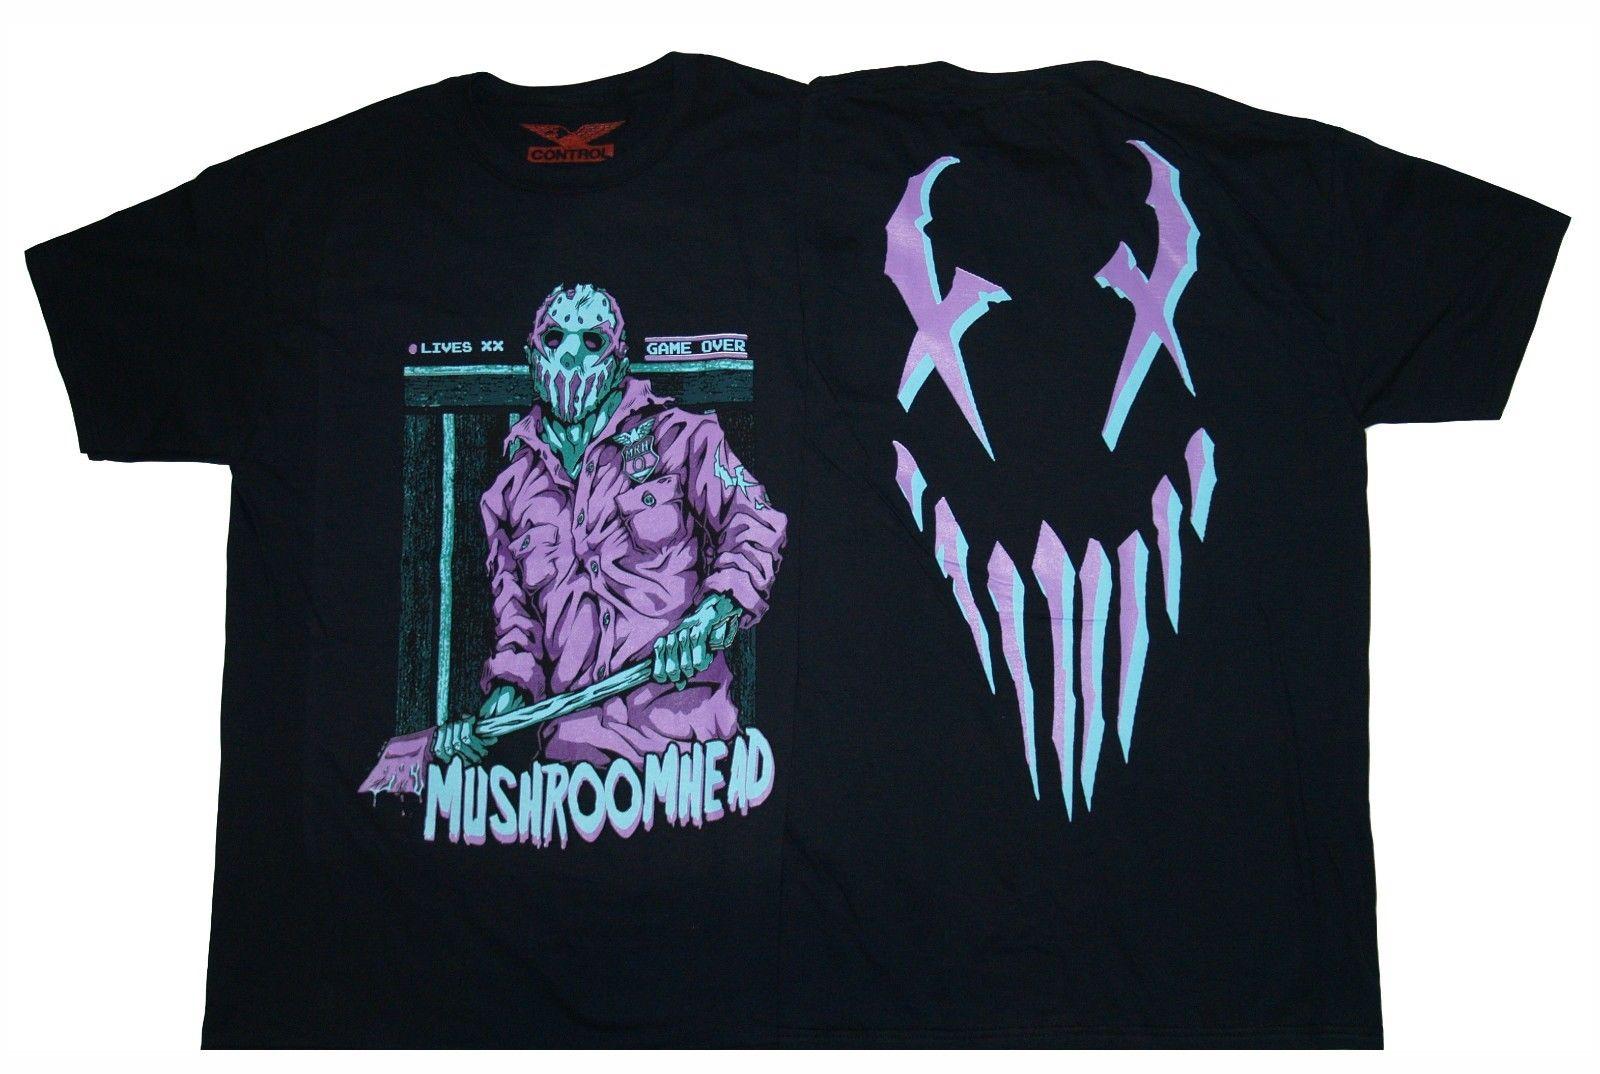 Mushroomhead XX T Shirt Boys Long Sleeve Tee Fashion Crew Neck Tops